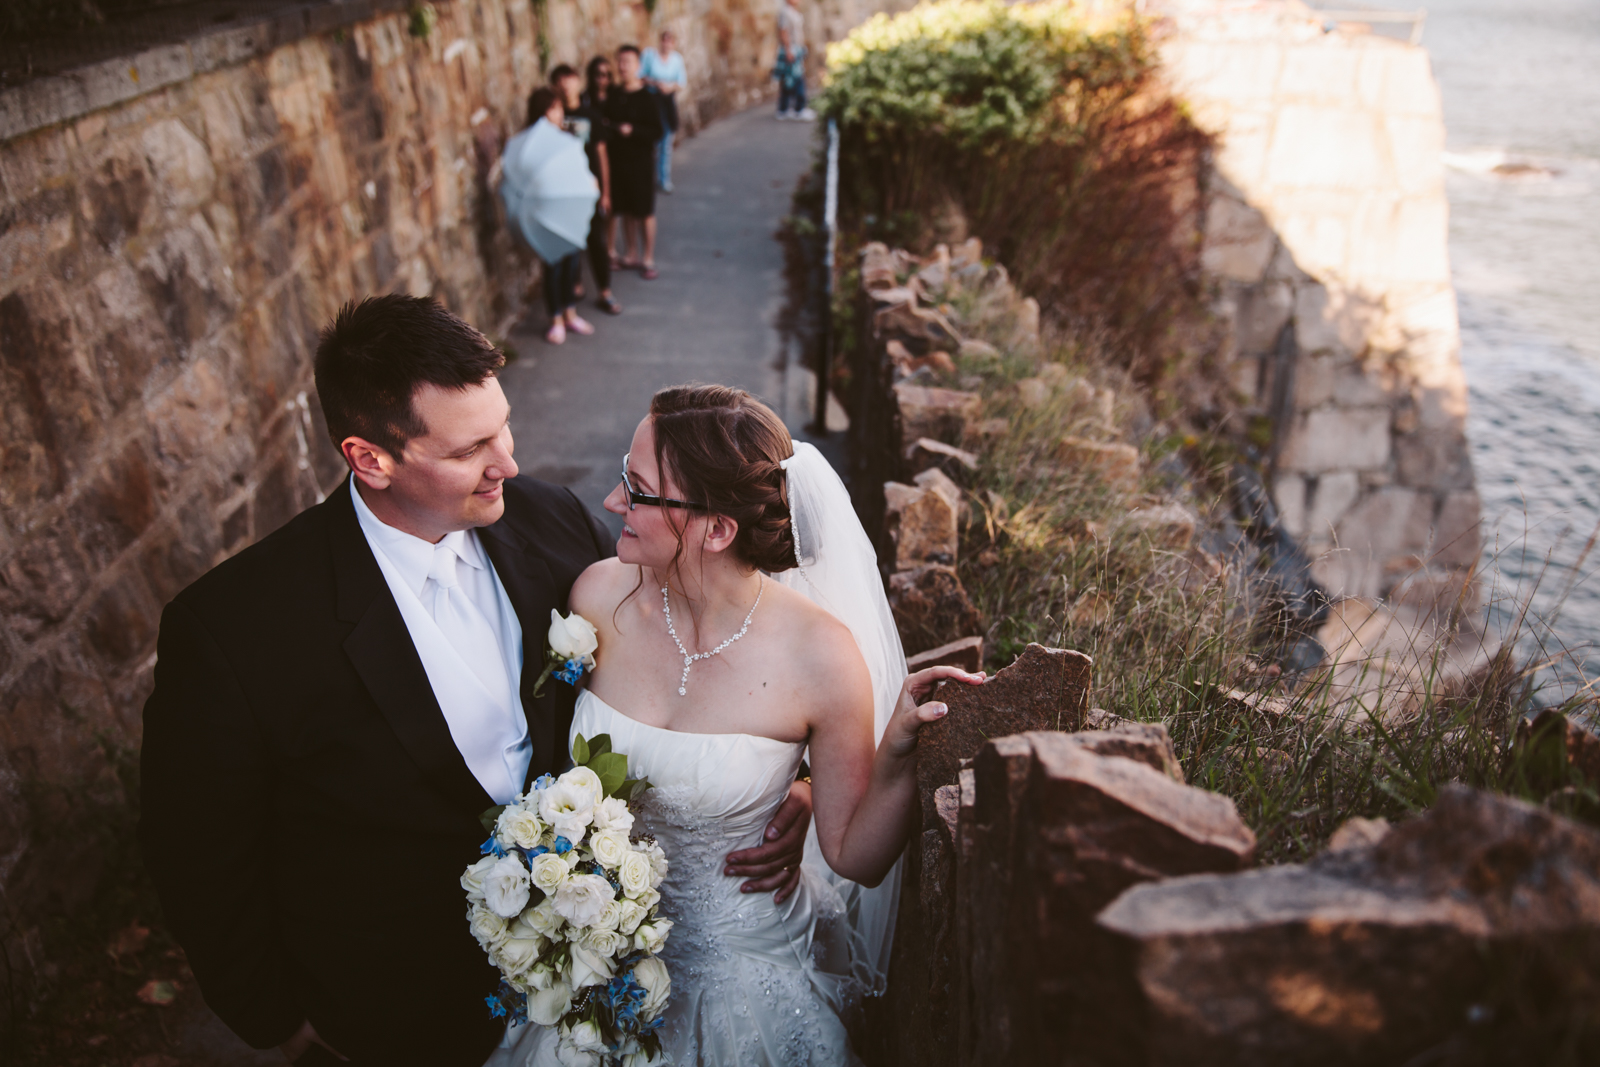 Eastons-Beach-Rotunda-Ballroom-Wedding-Newport-Rhode-Island-PhotographybyAmandaMorgan-52.jpg